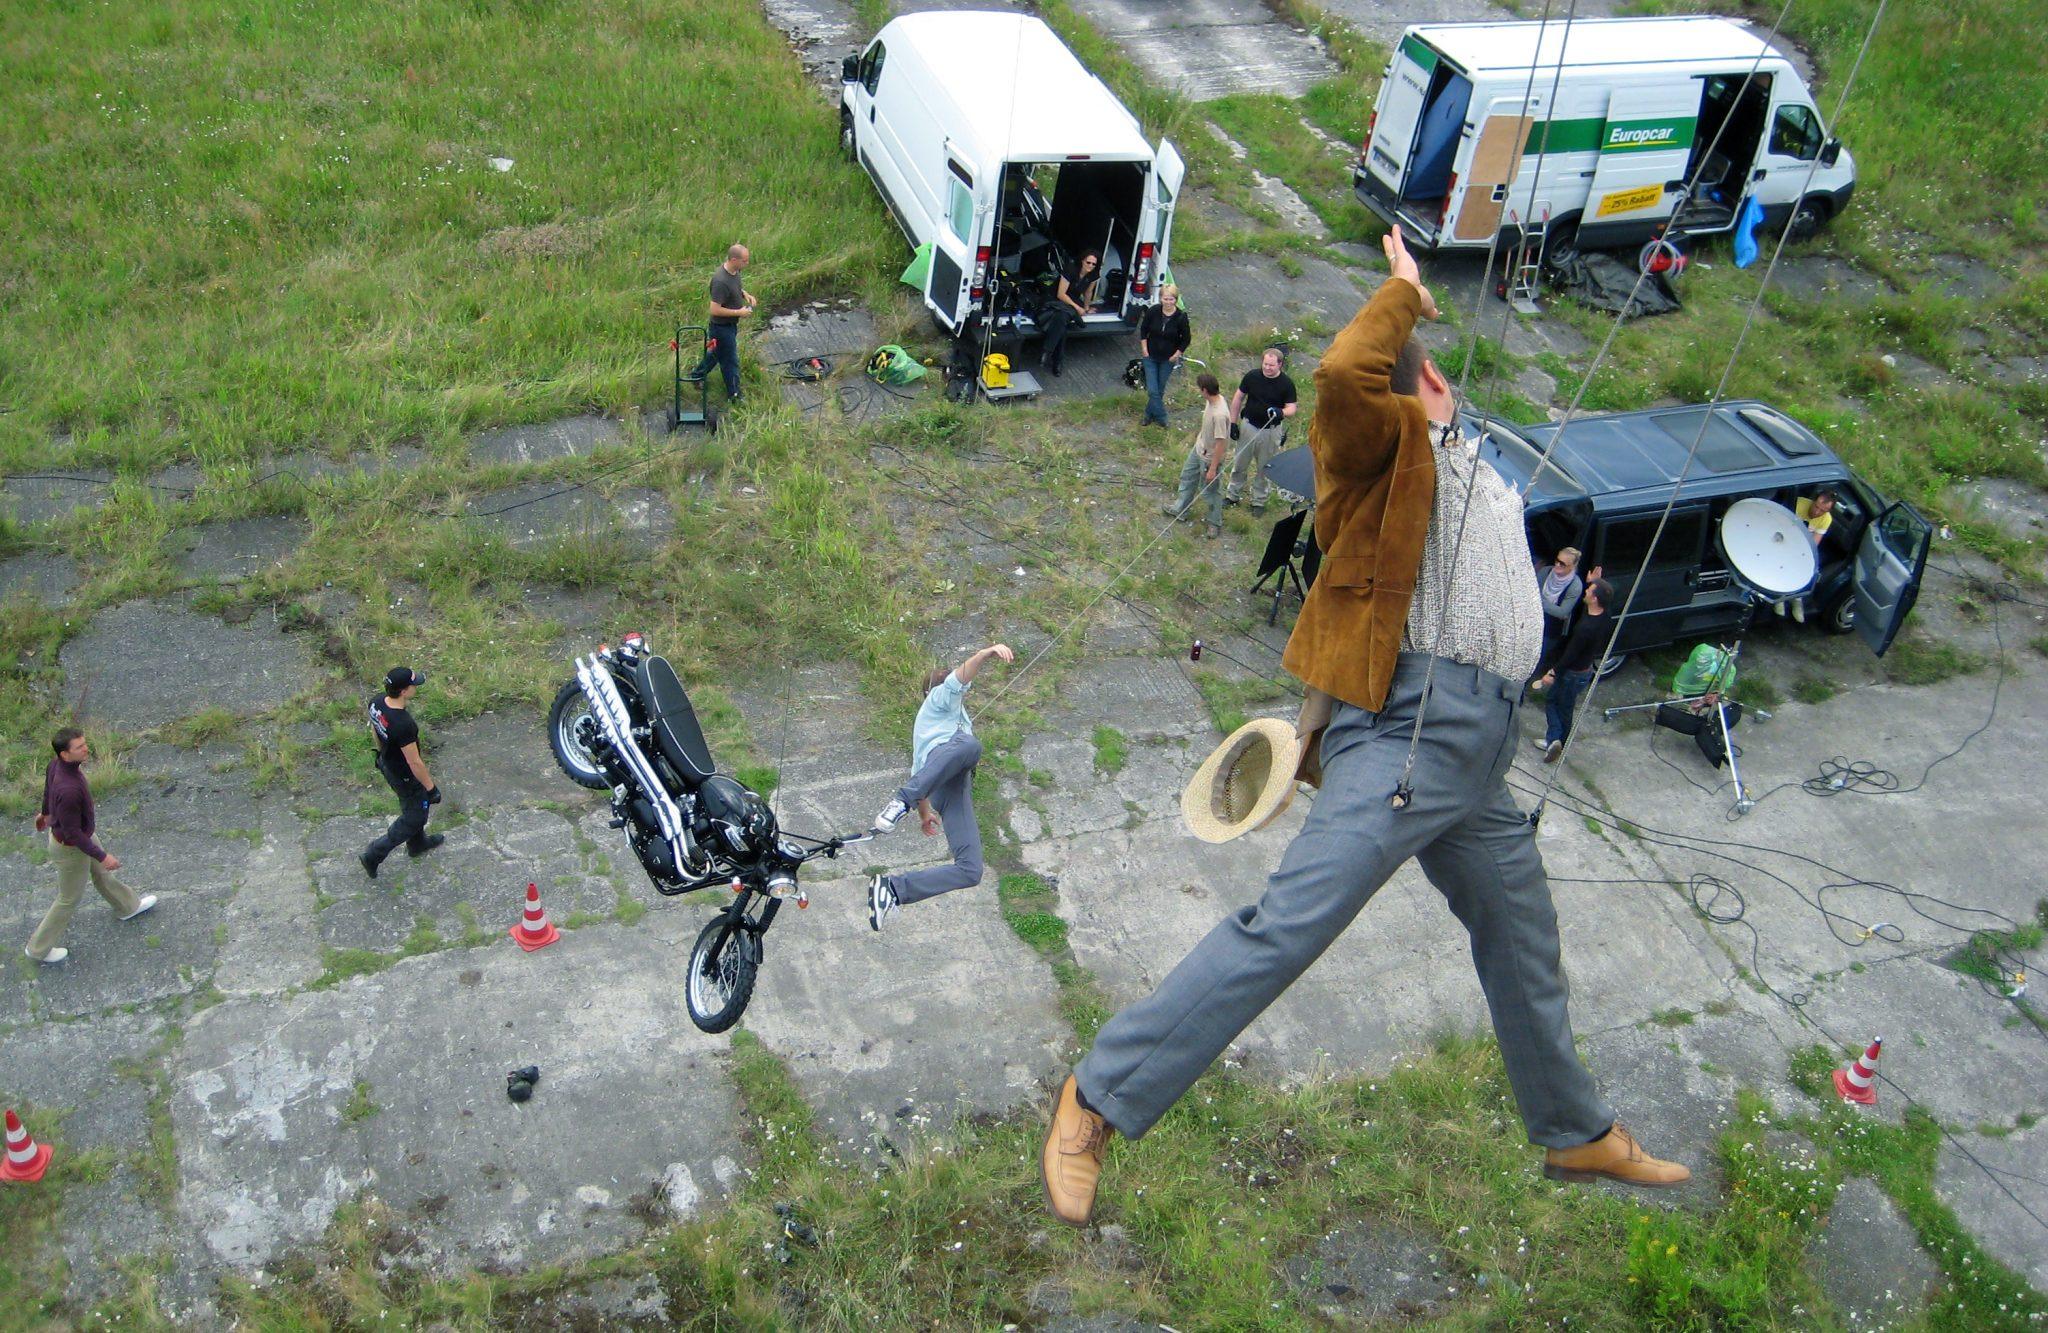 MG Action, Martin Goeres, Stunt koordination, Stunt Rigging, Alarm Für Cobra 11, Fotoshooting